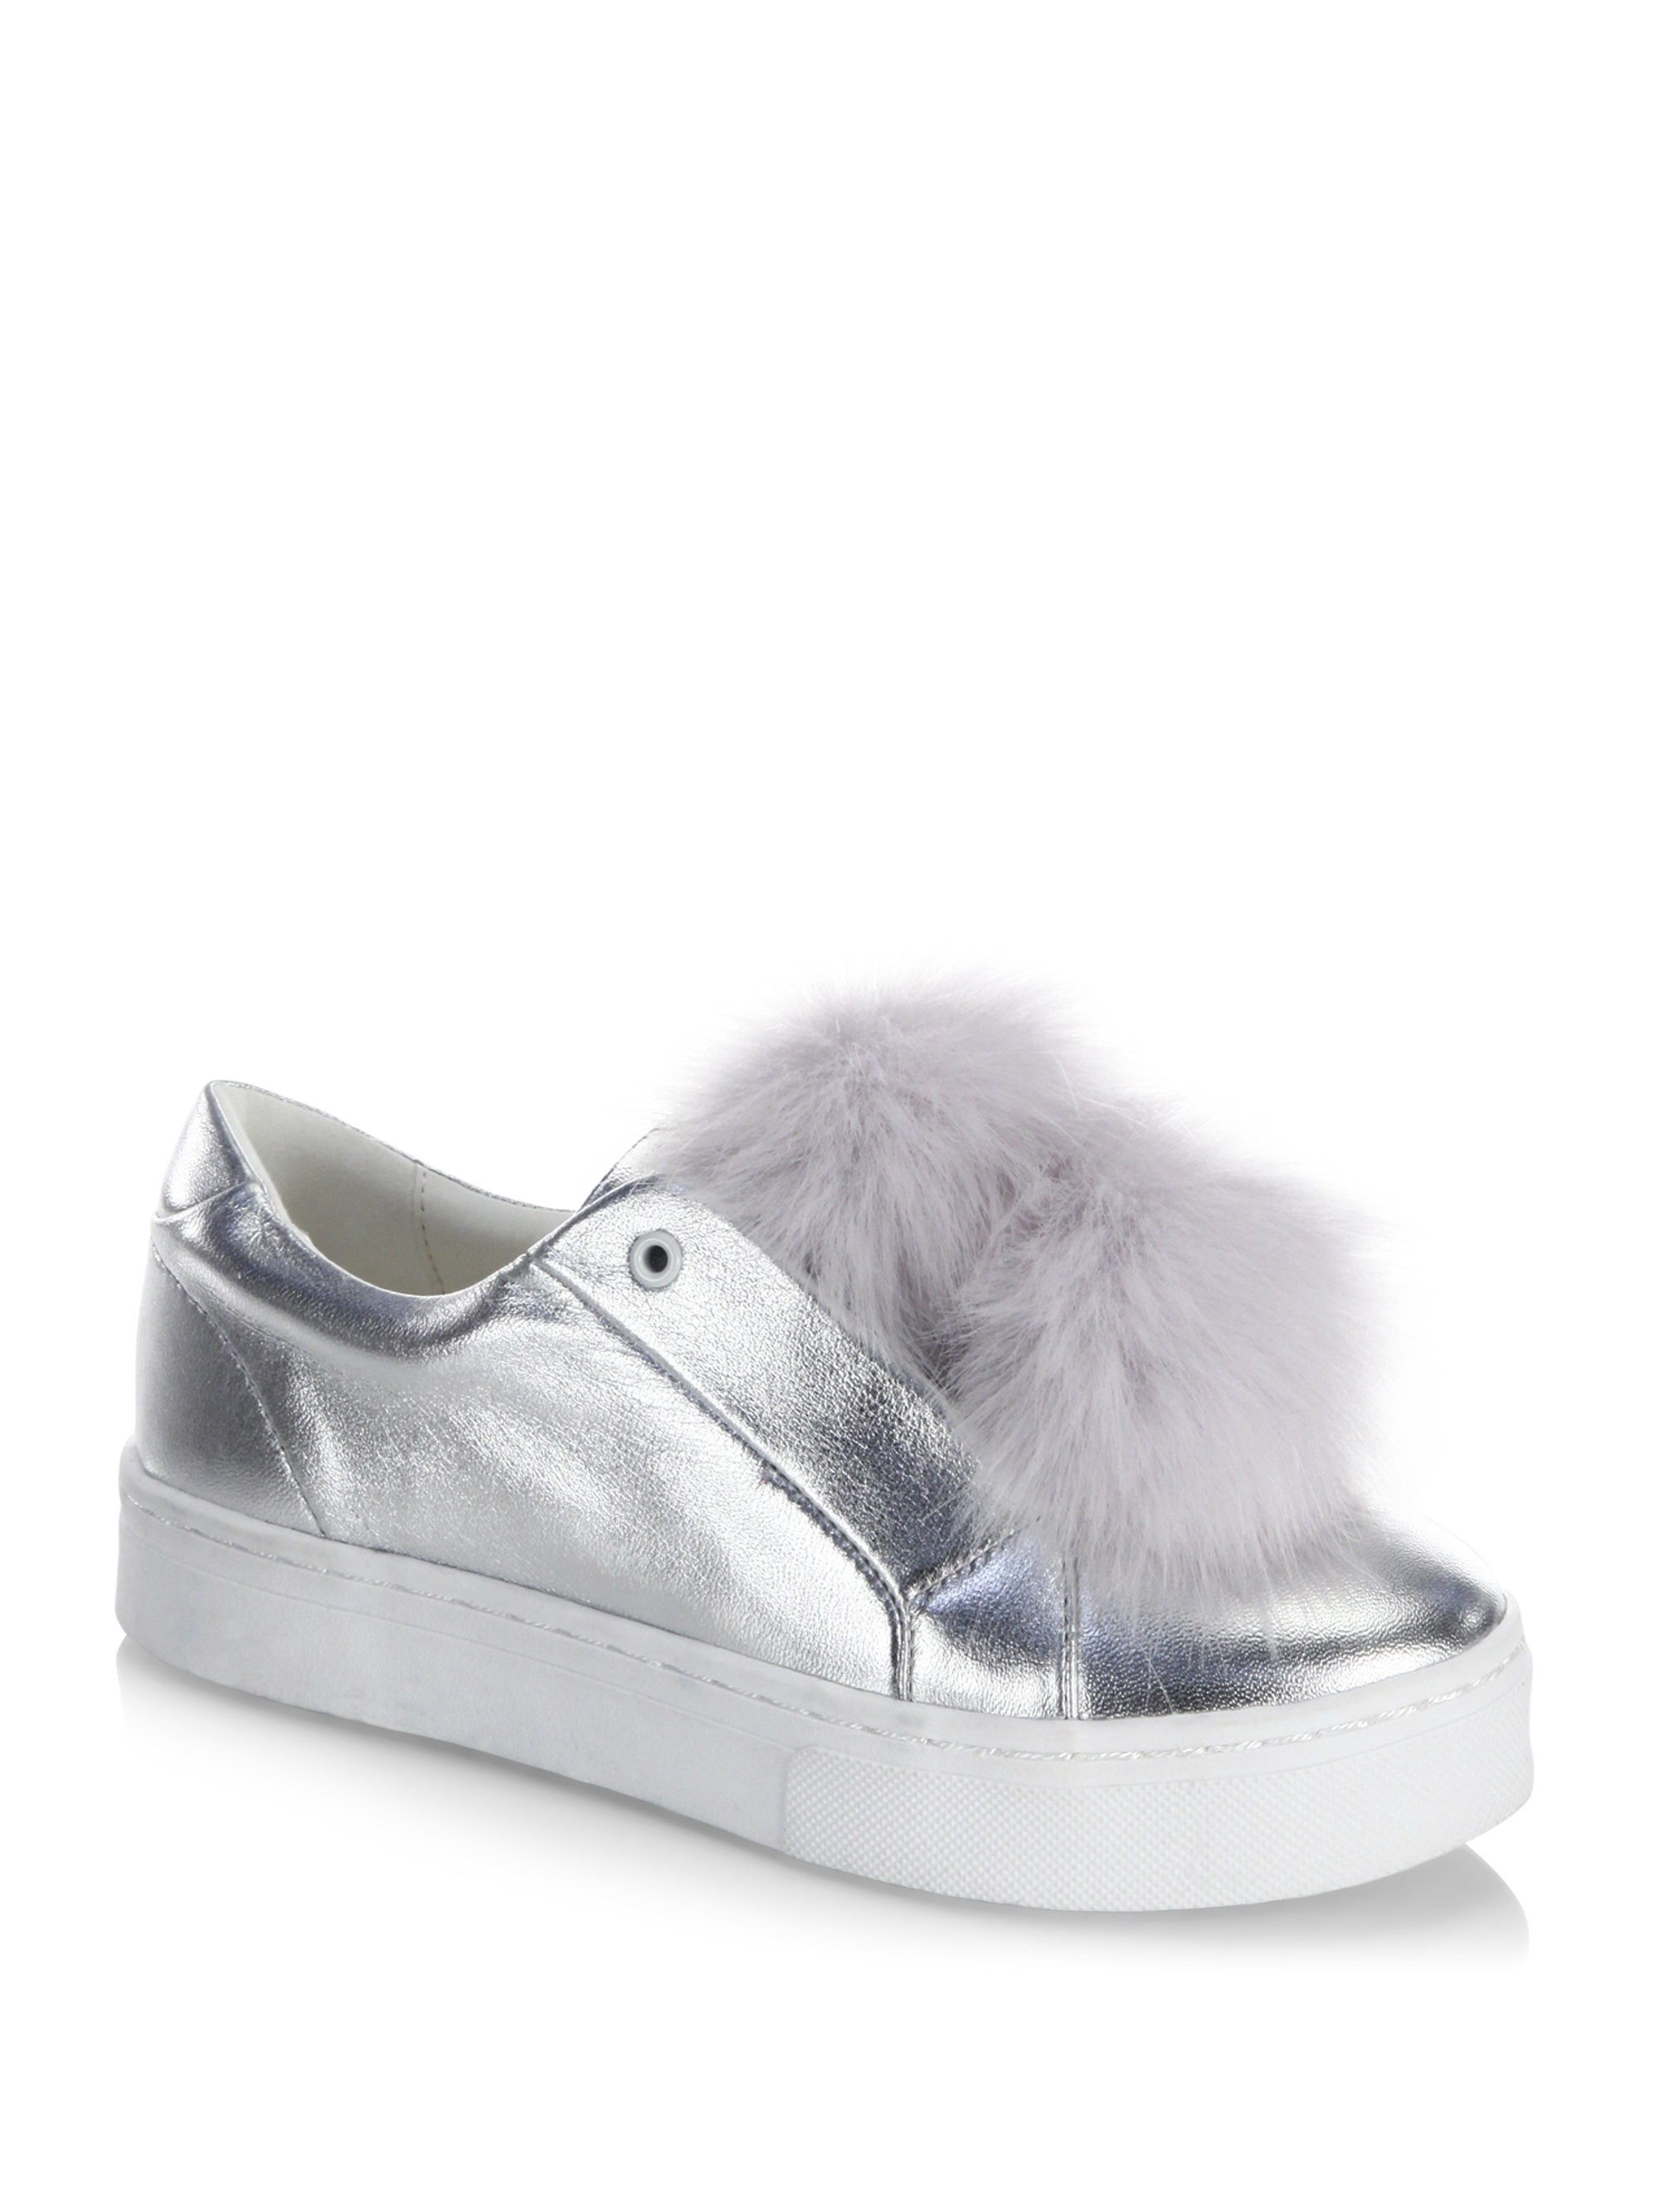 950ce8b540613c Sam Edelman Leya Metallic Faux Fur Pompom Accented Sneakers - Soft Silver  5.5